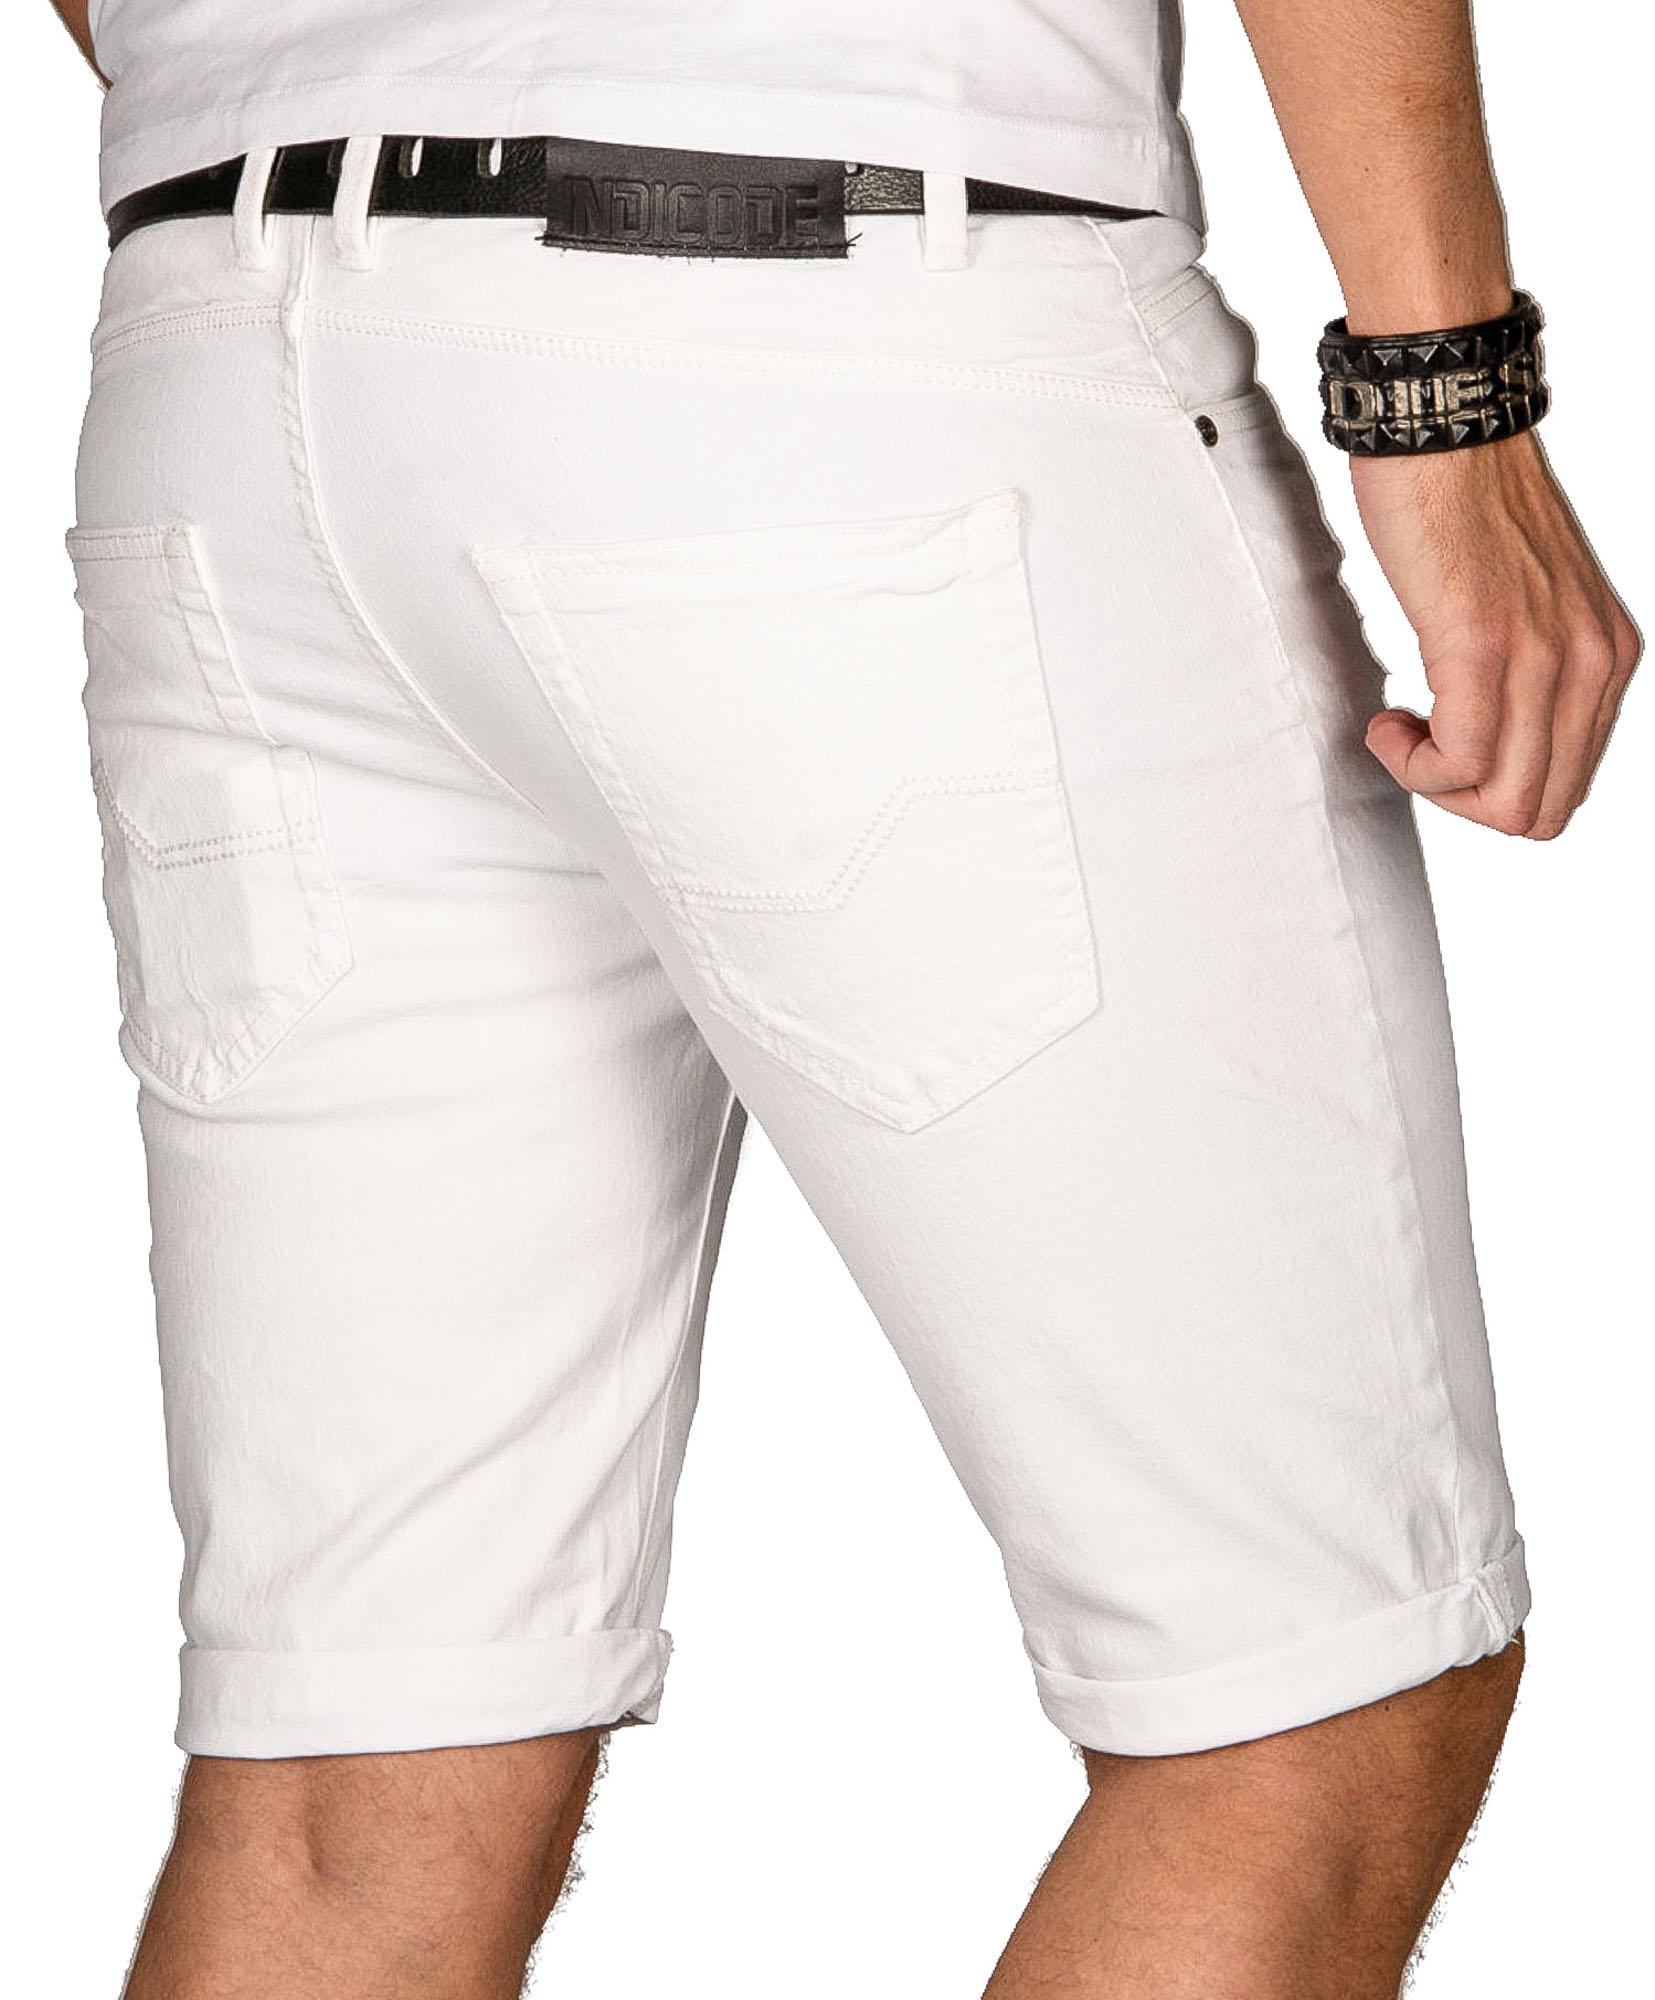 Indicode-Herren-Sommer-Bermuda-Jeans-Shorts-kurze-Hose-Sommerhose-Short-Neu-B556 Indexbild 16